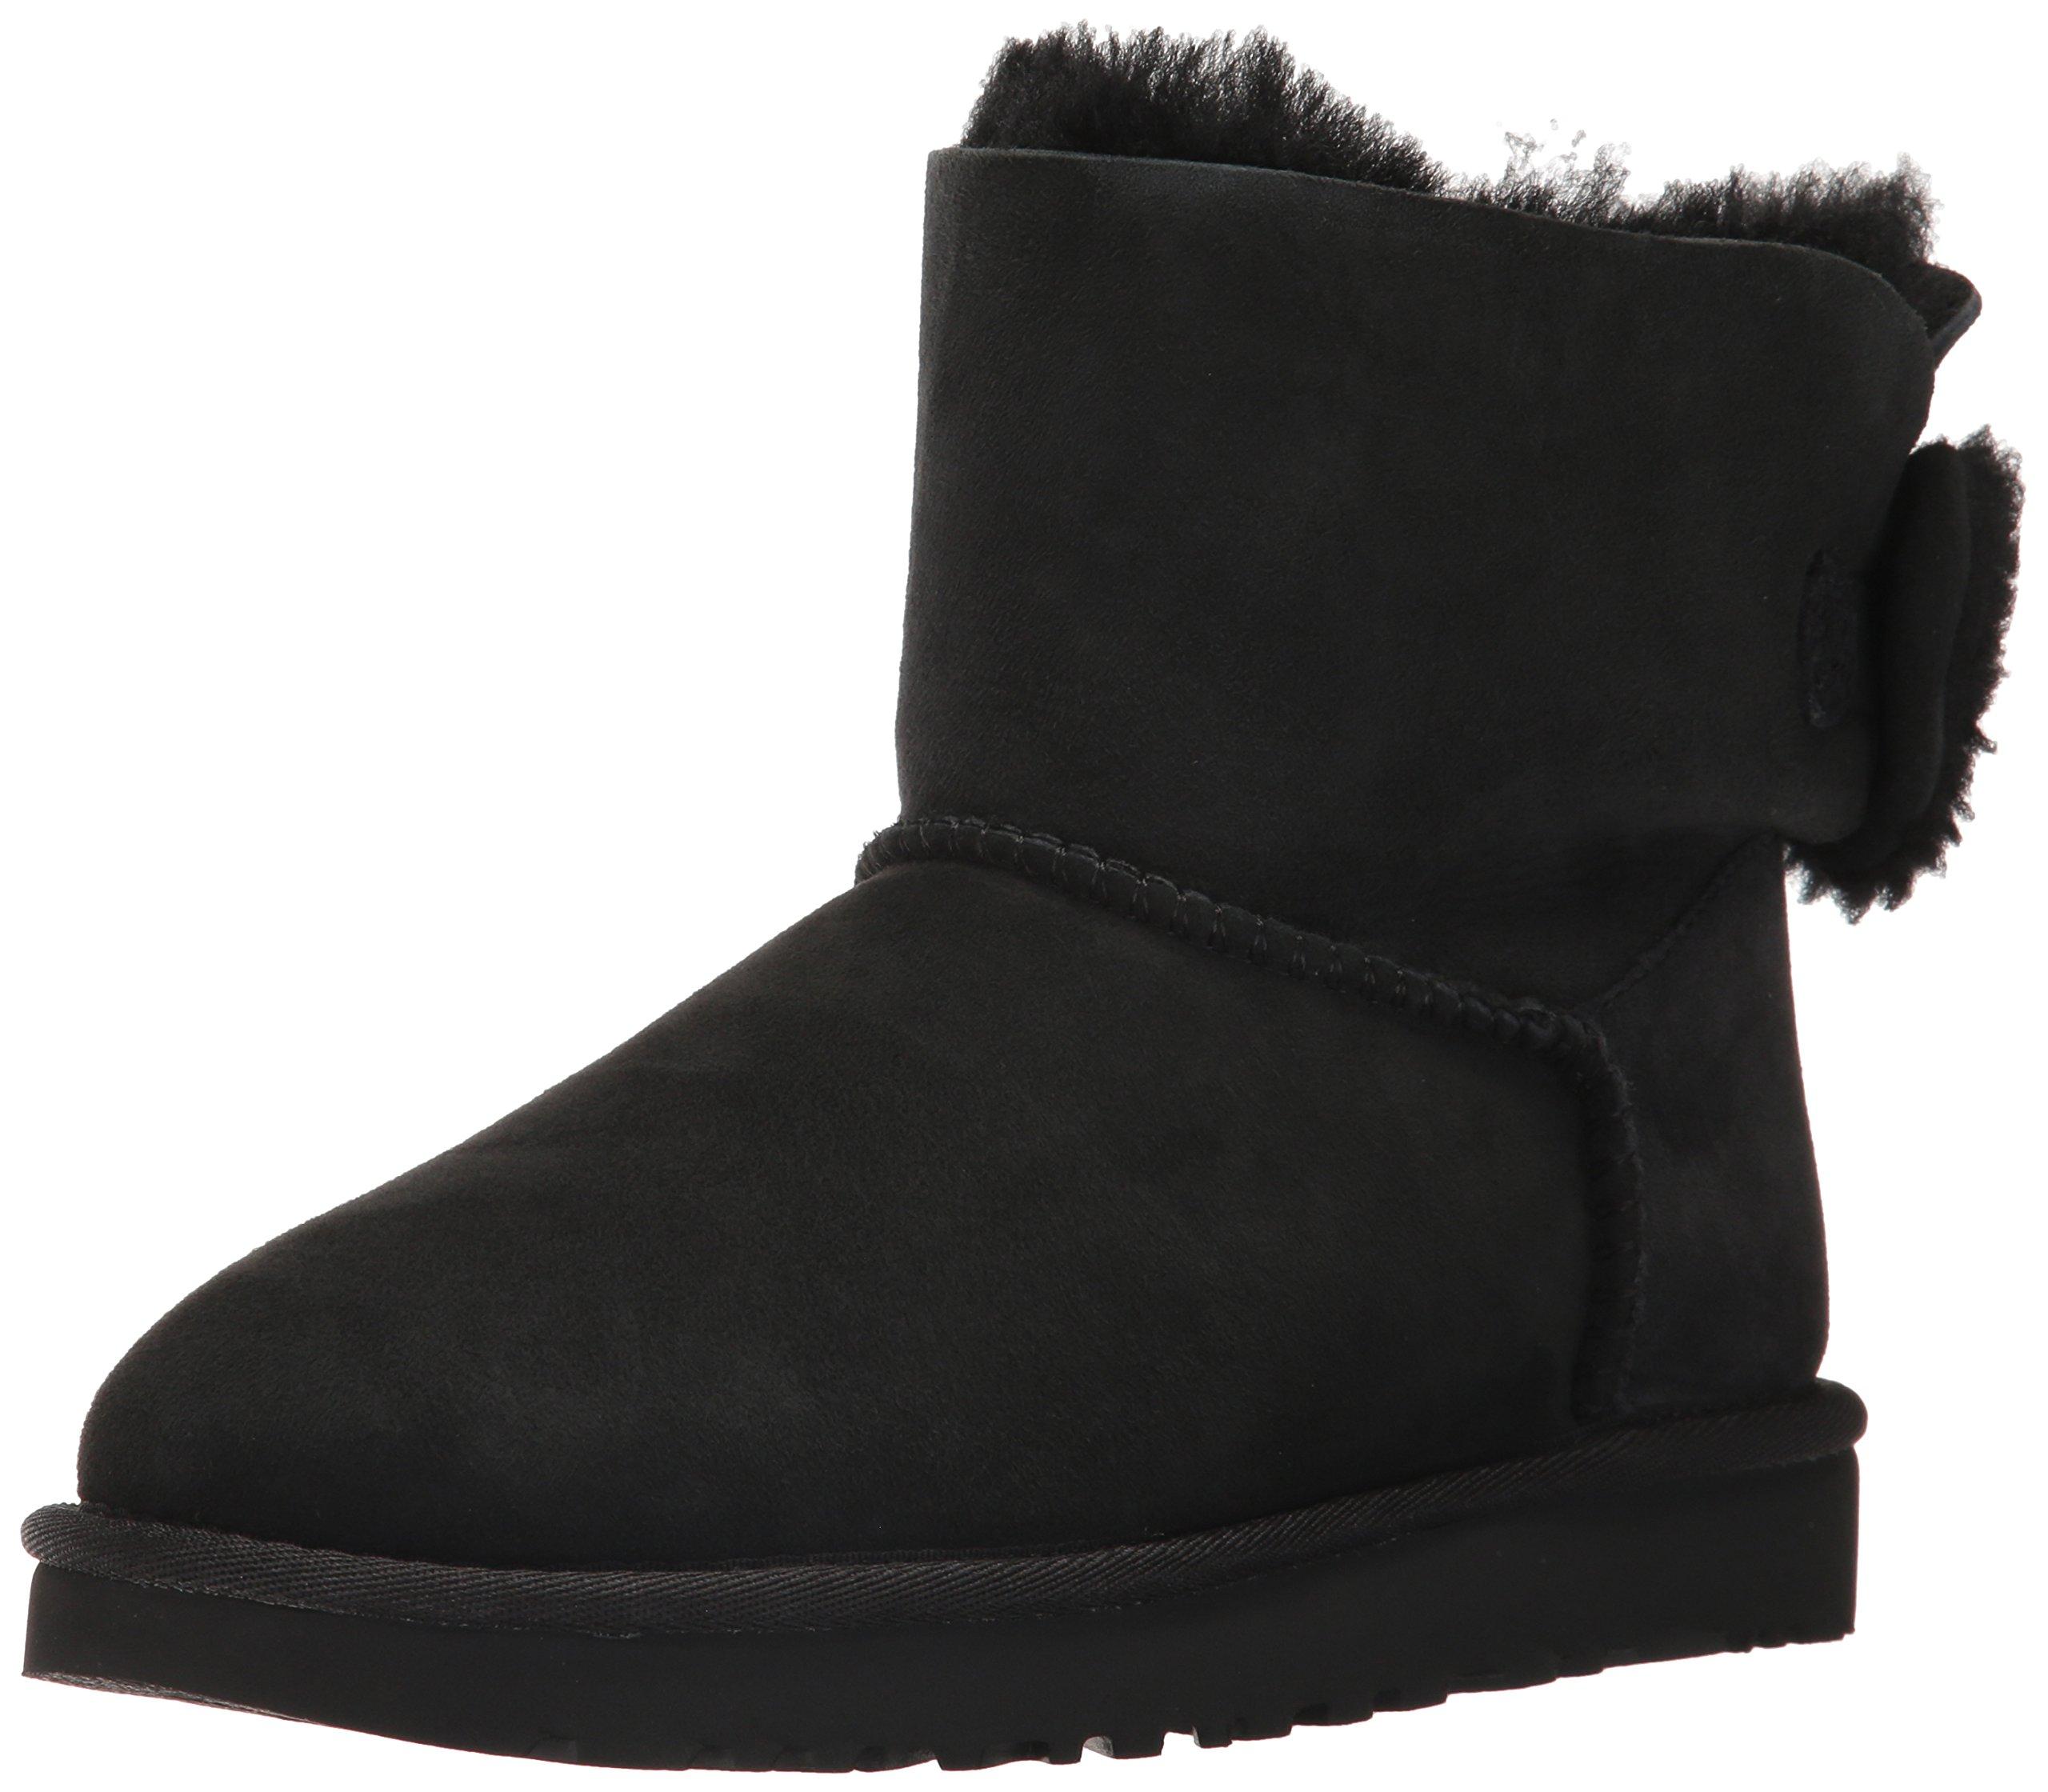 UGG Women's Arielle Winter Boot, Black, 7 M US